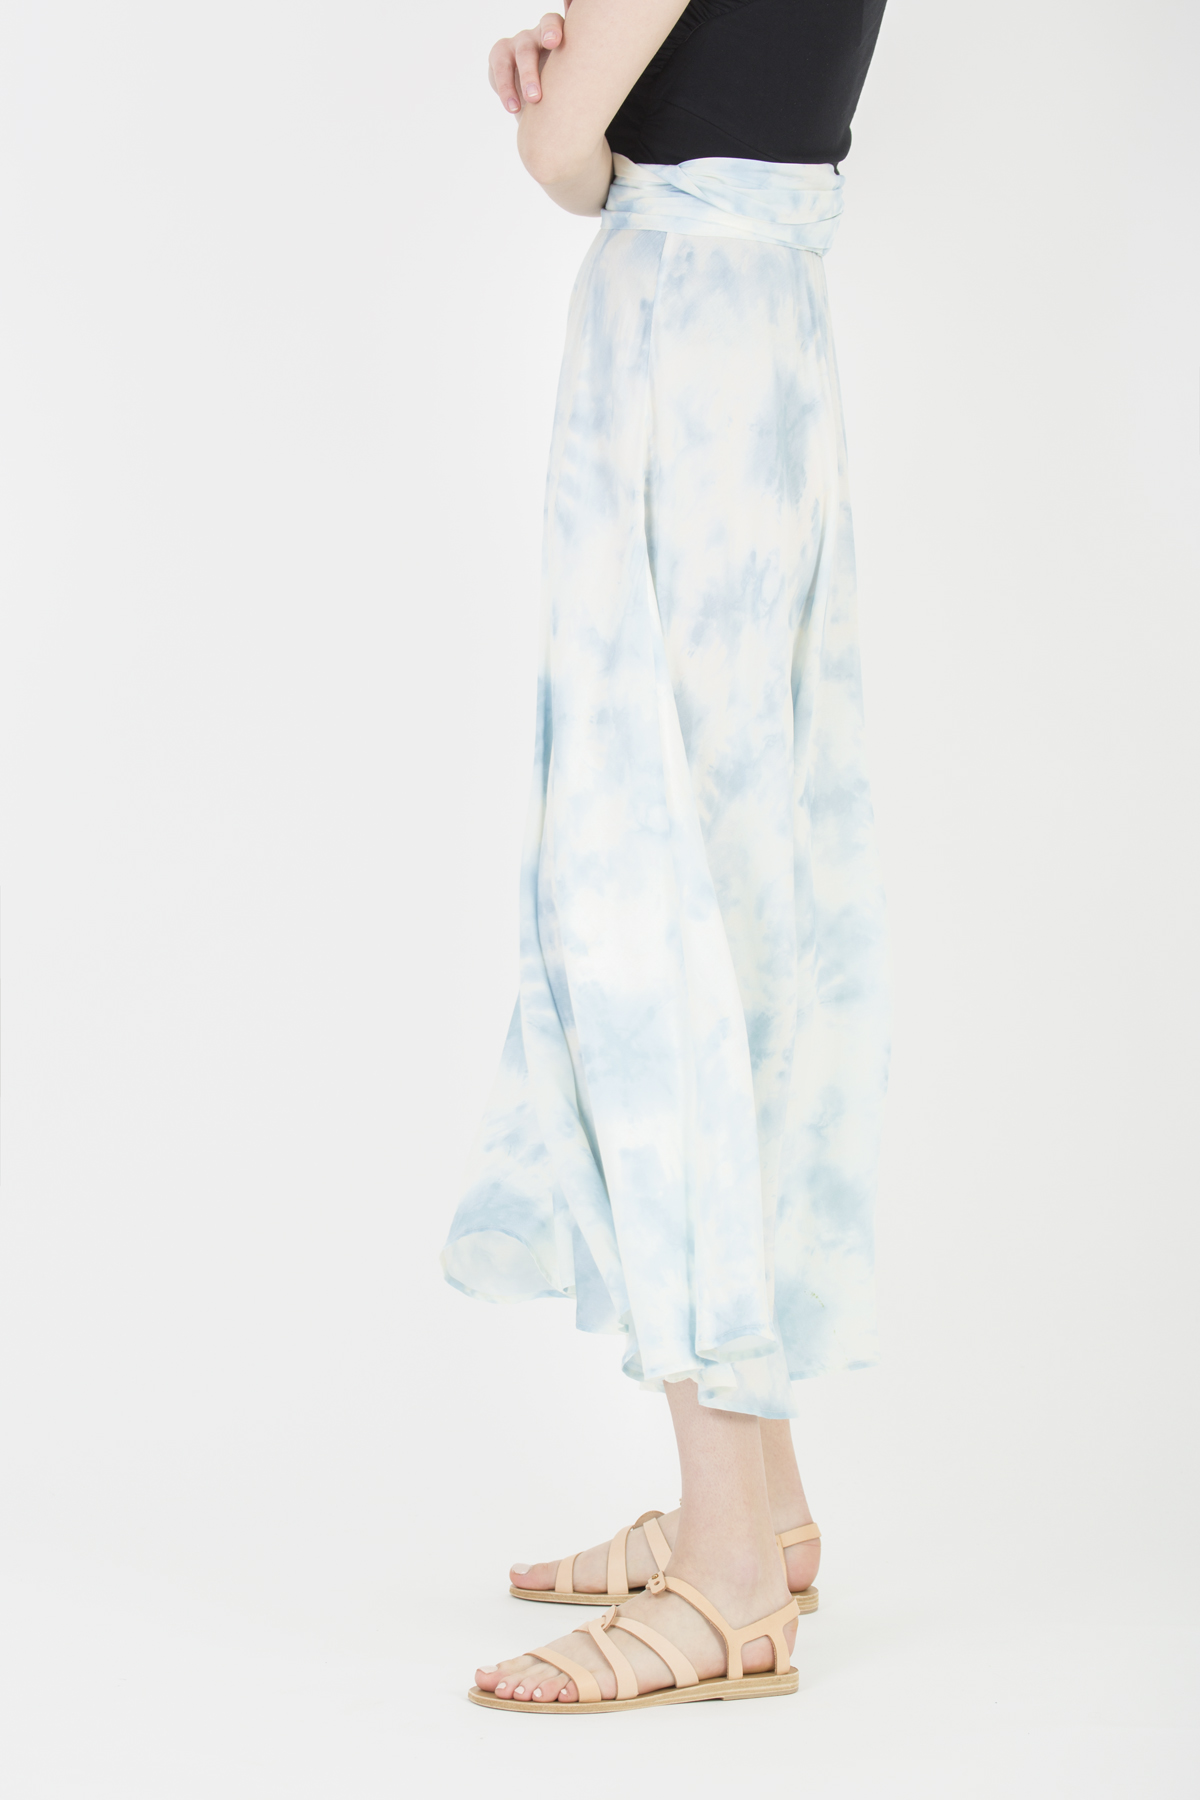 billie-skirt-blue-tie-dye-uniforme-viscose-matchboxathens